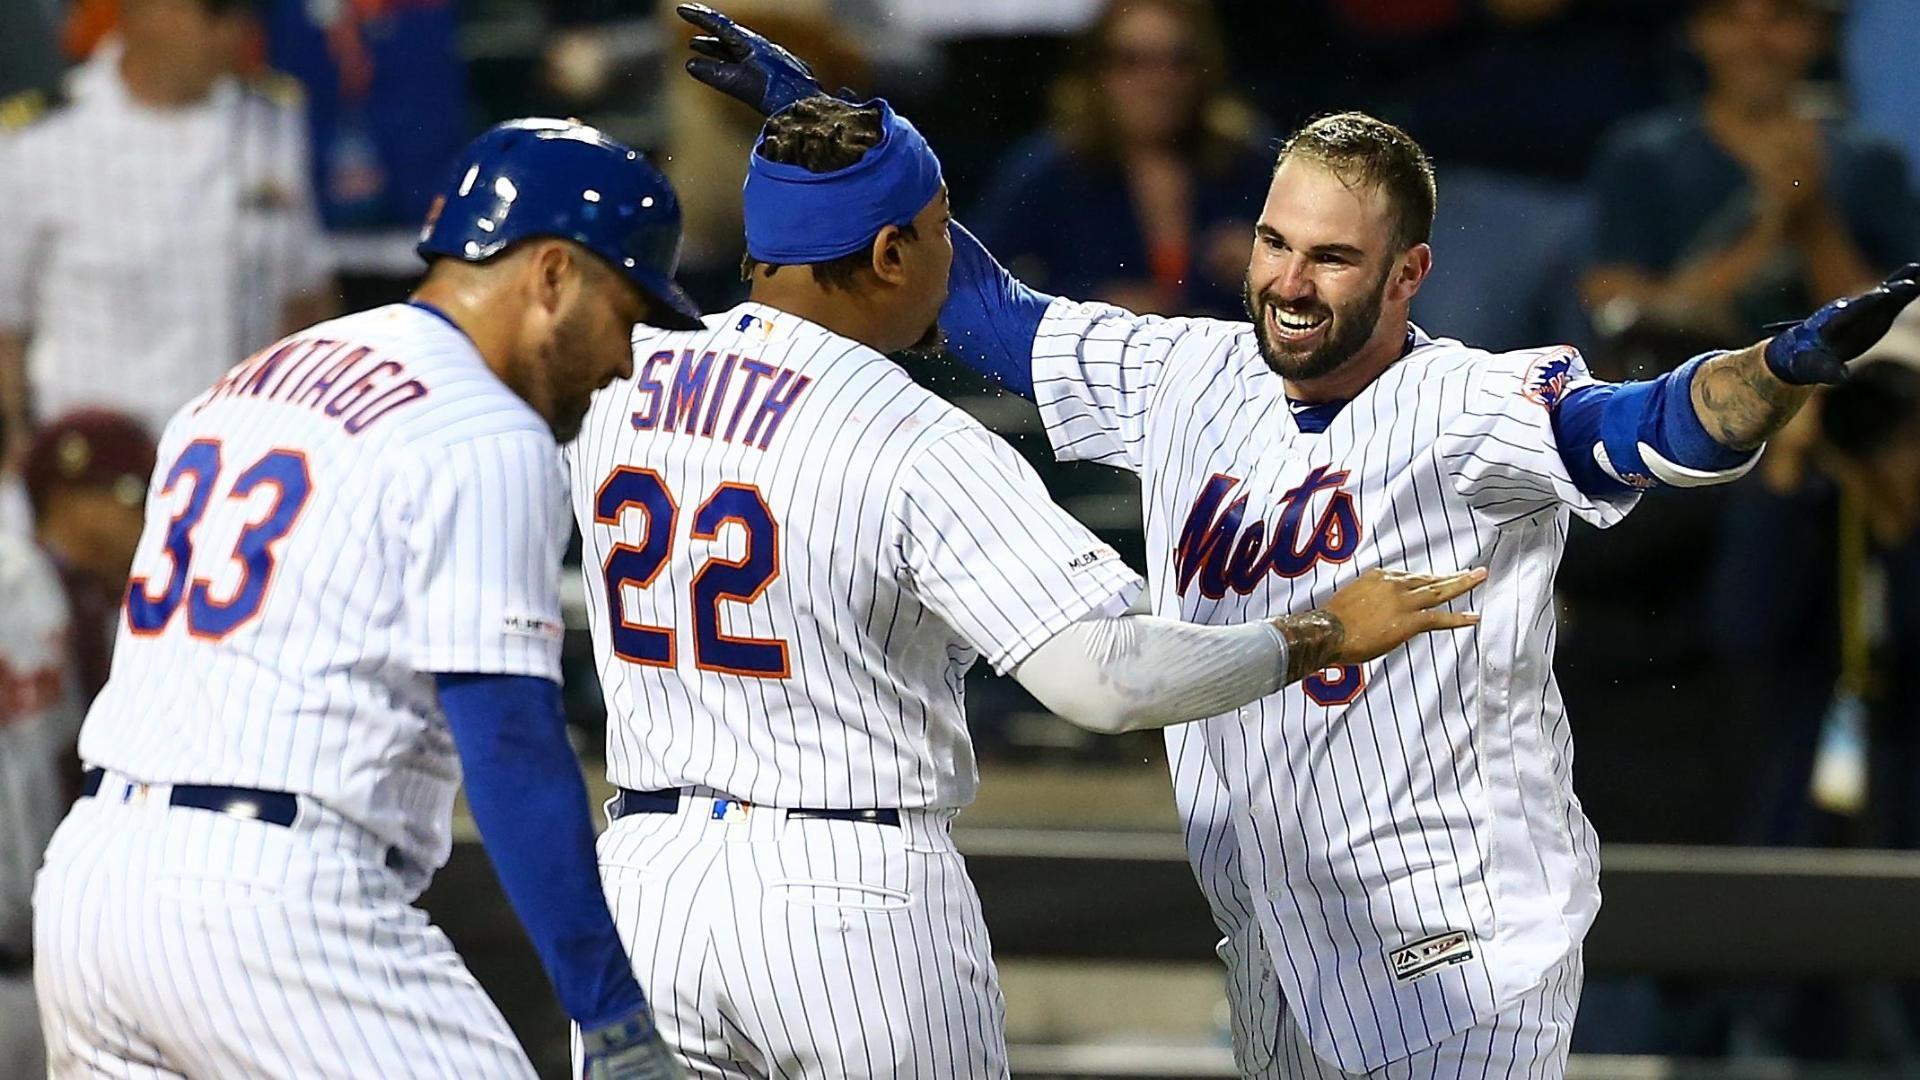 Nido homers in 13th, Ramos homers twice as Mets beat Tigers